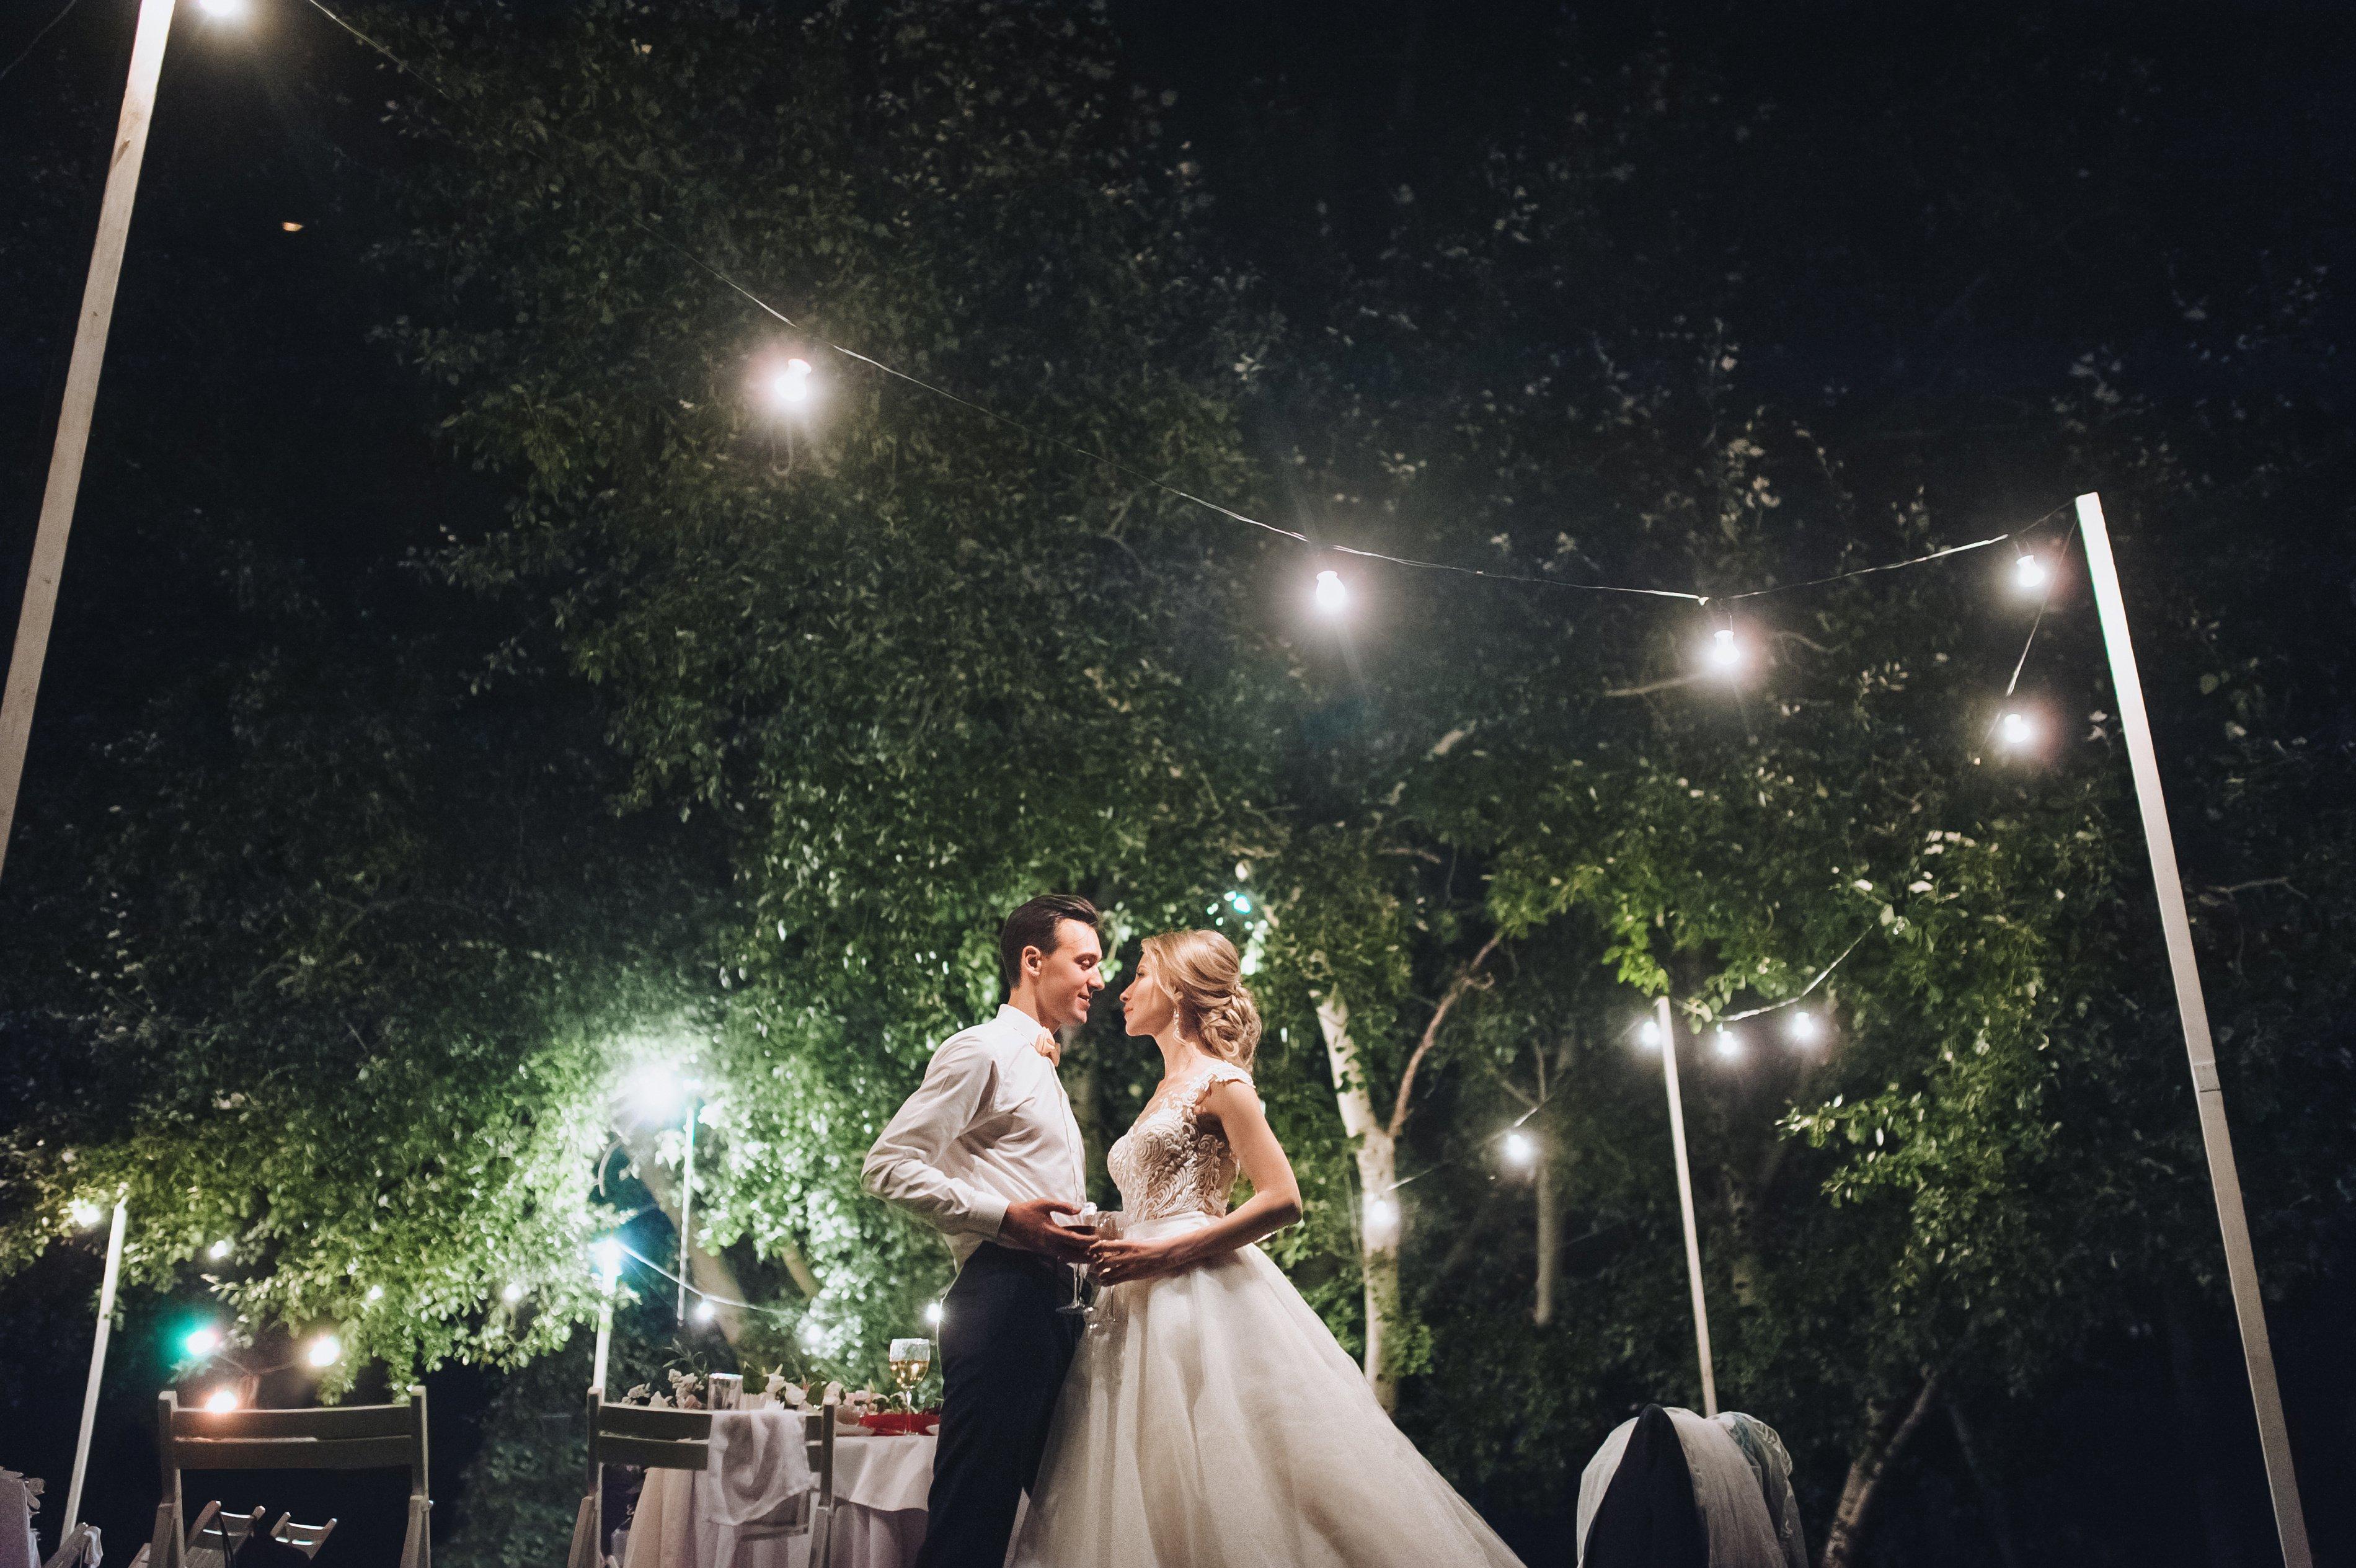 Outdoor Wedding - fairylights